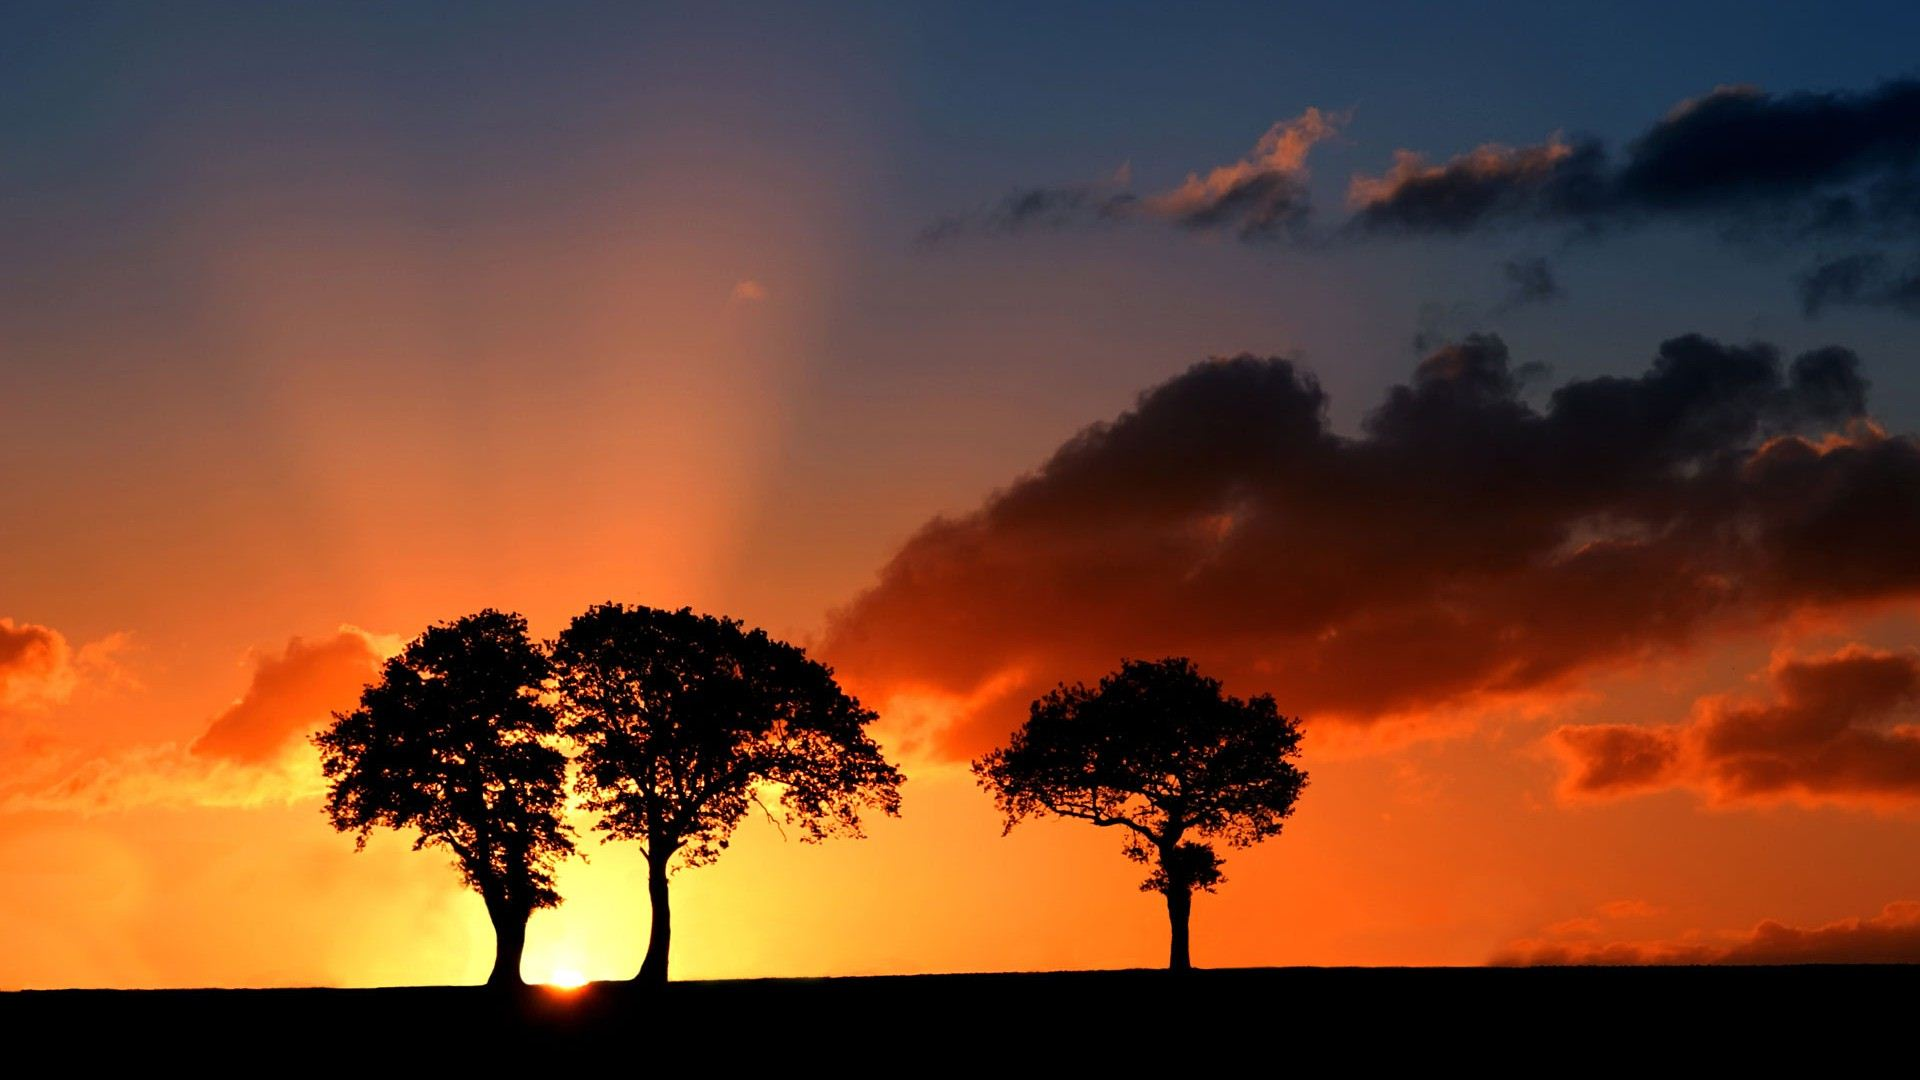 tree silhouette hd